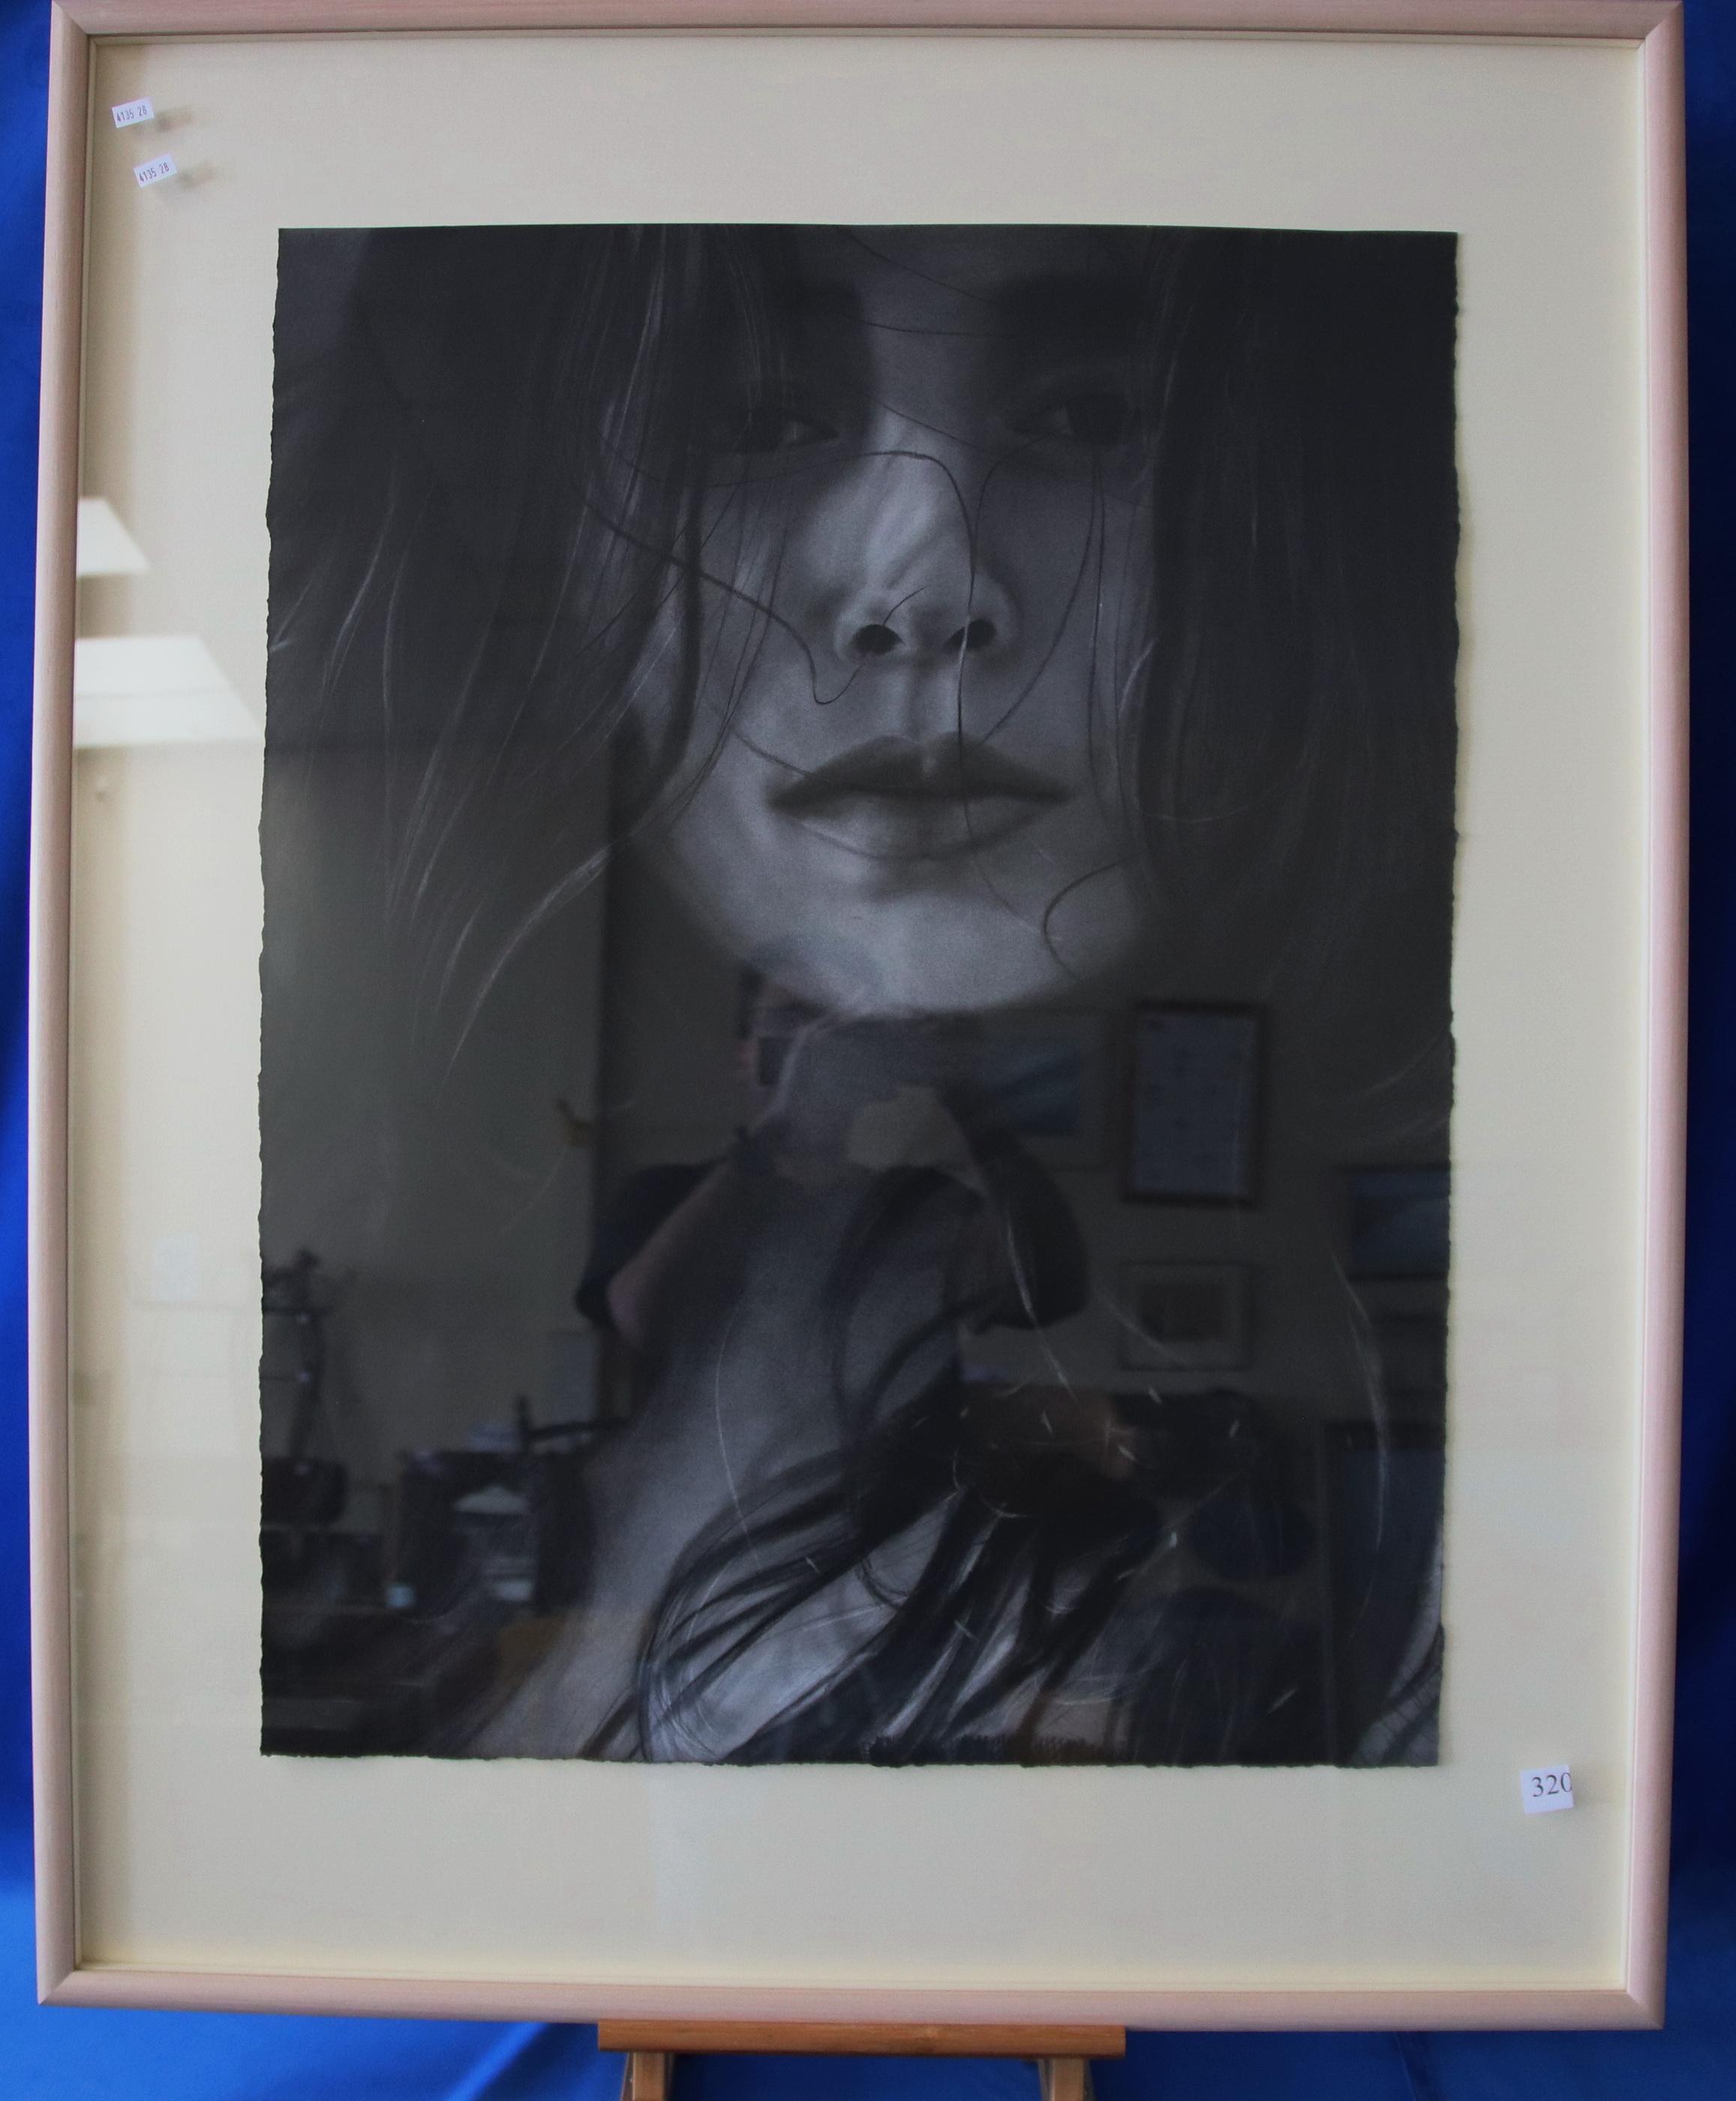 LUCINDA ELLIOTT BLACK EYES 1991 CHARCOAL ON PAPER 84 X 64.9